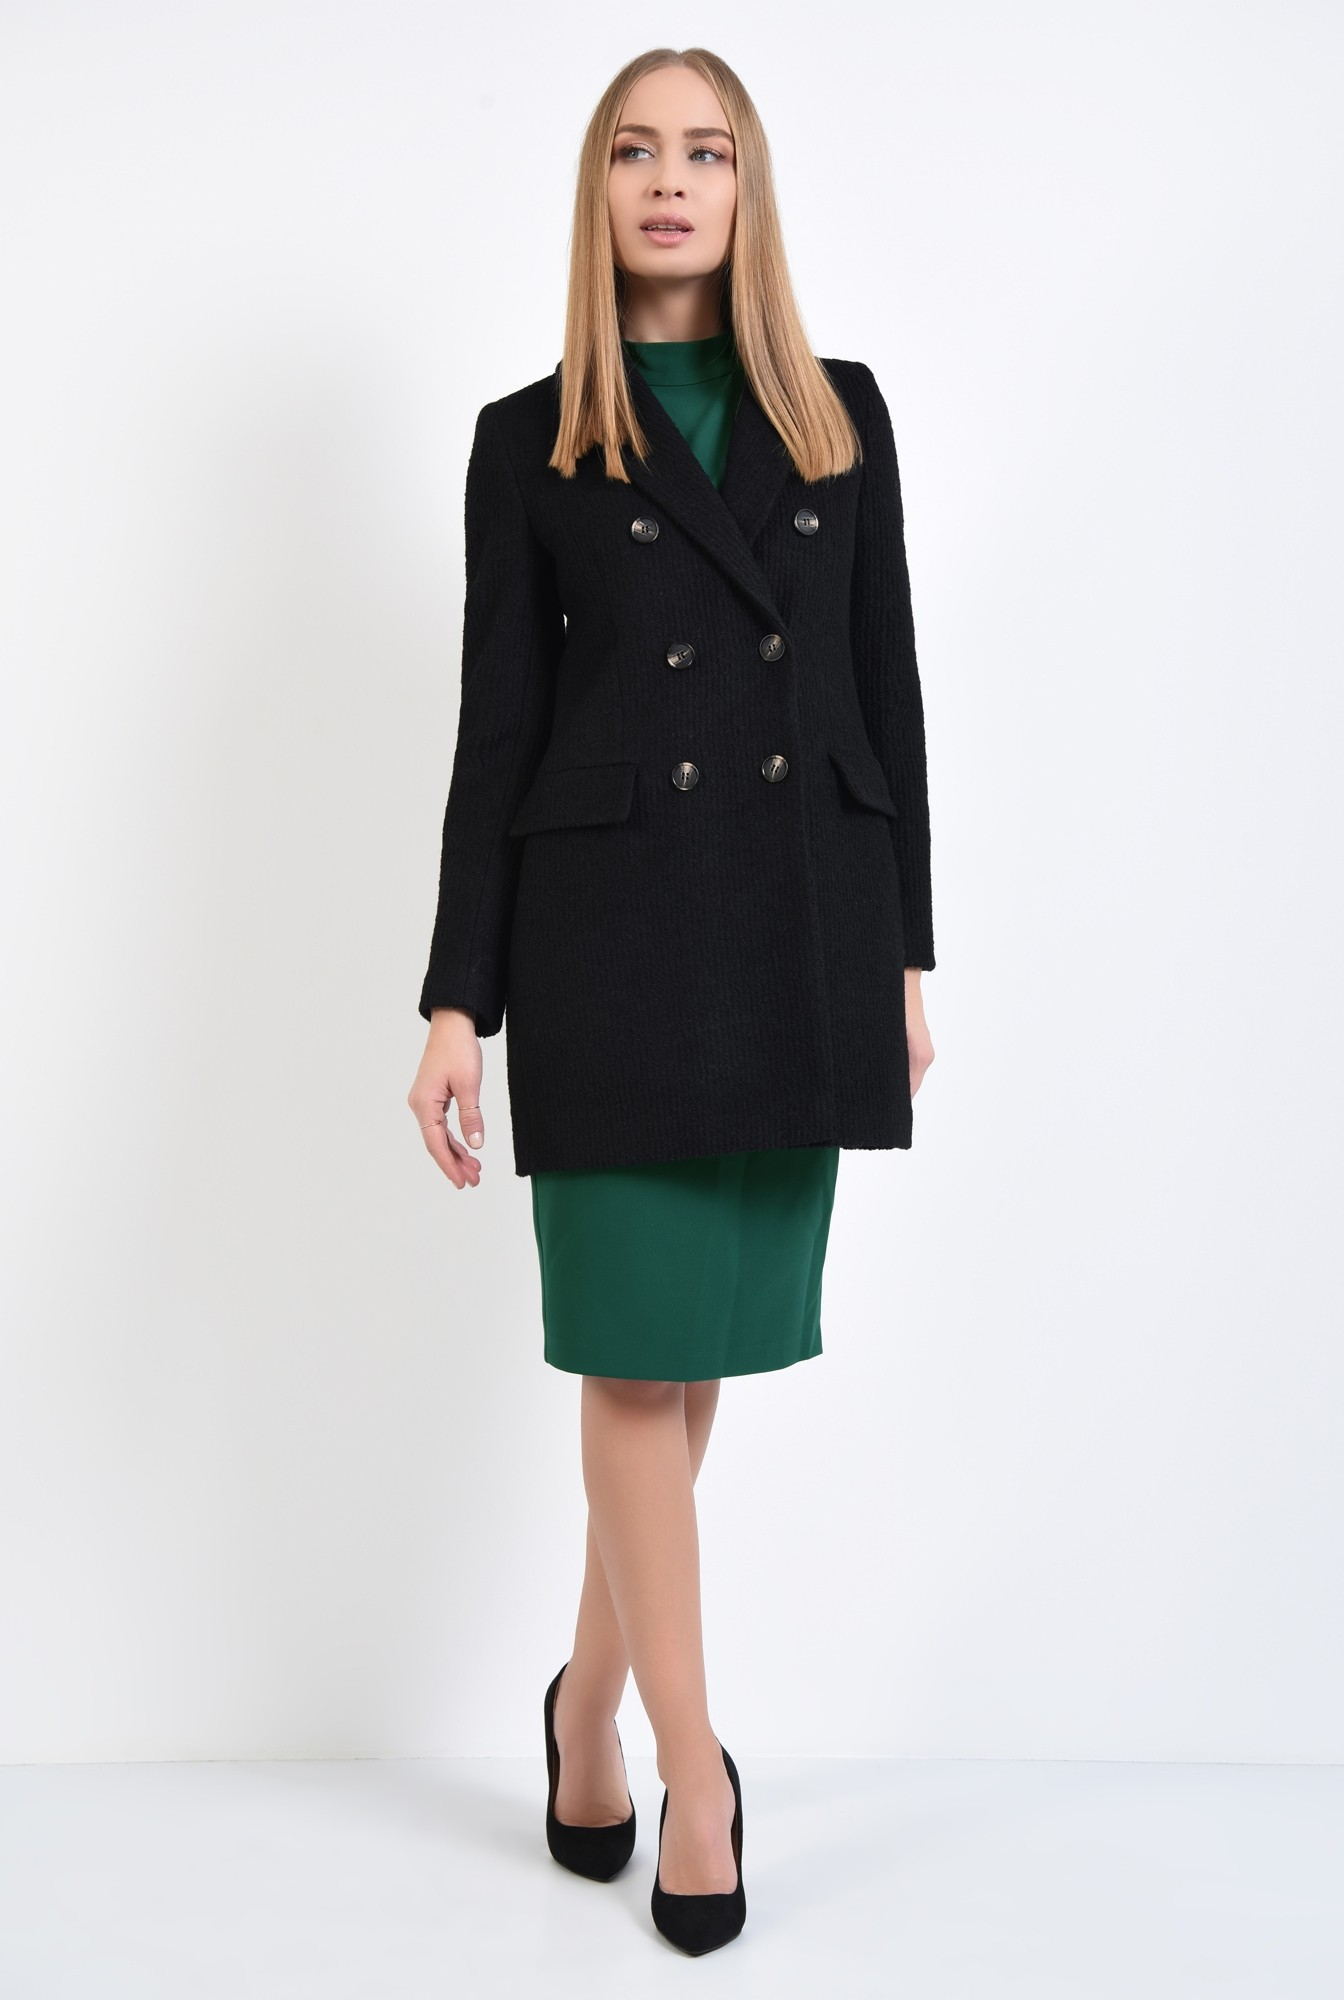 3 - palton dama, online, negru, drept, doua randuri de nasturi